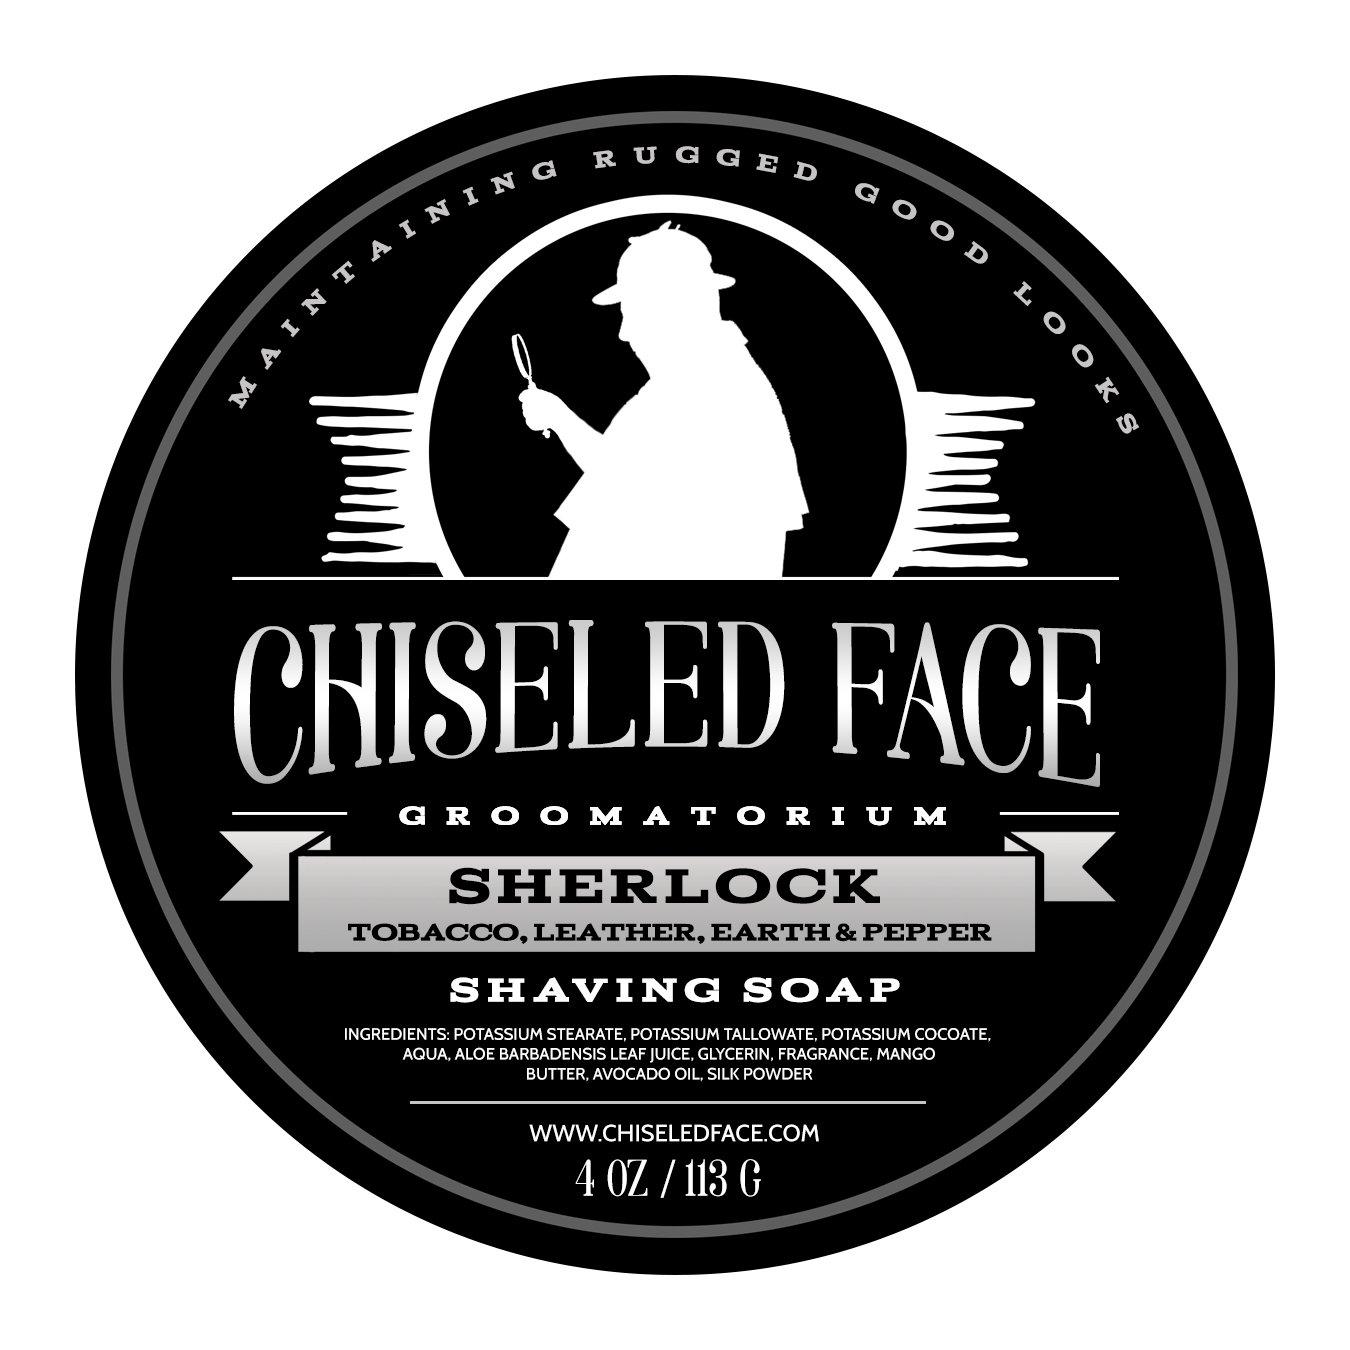 Sherlock - Handmade Luxury Shaving Soap from Chiseled Face Groomatorium